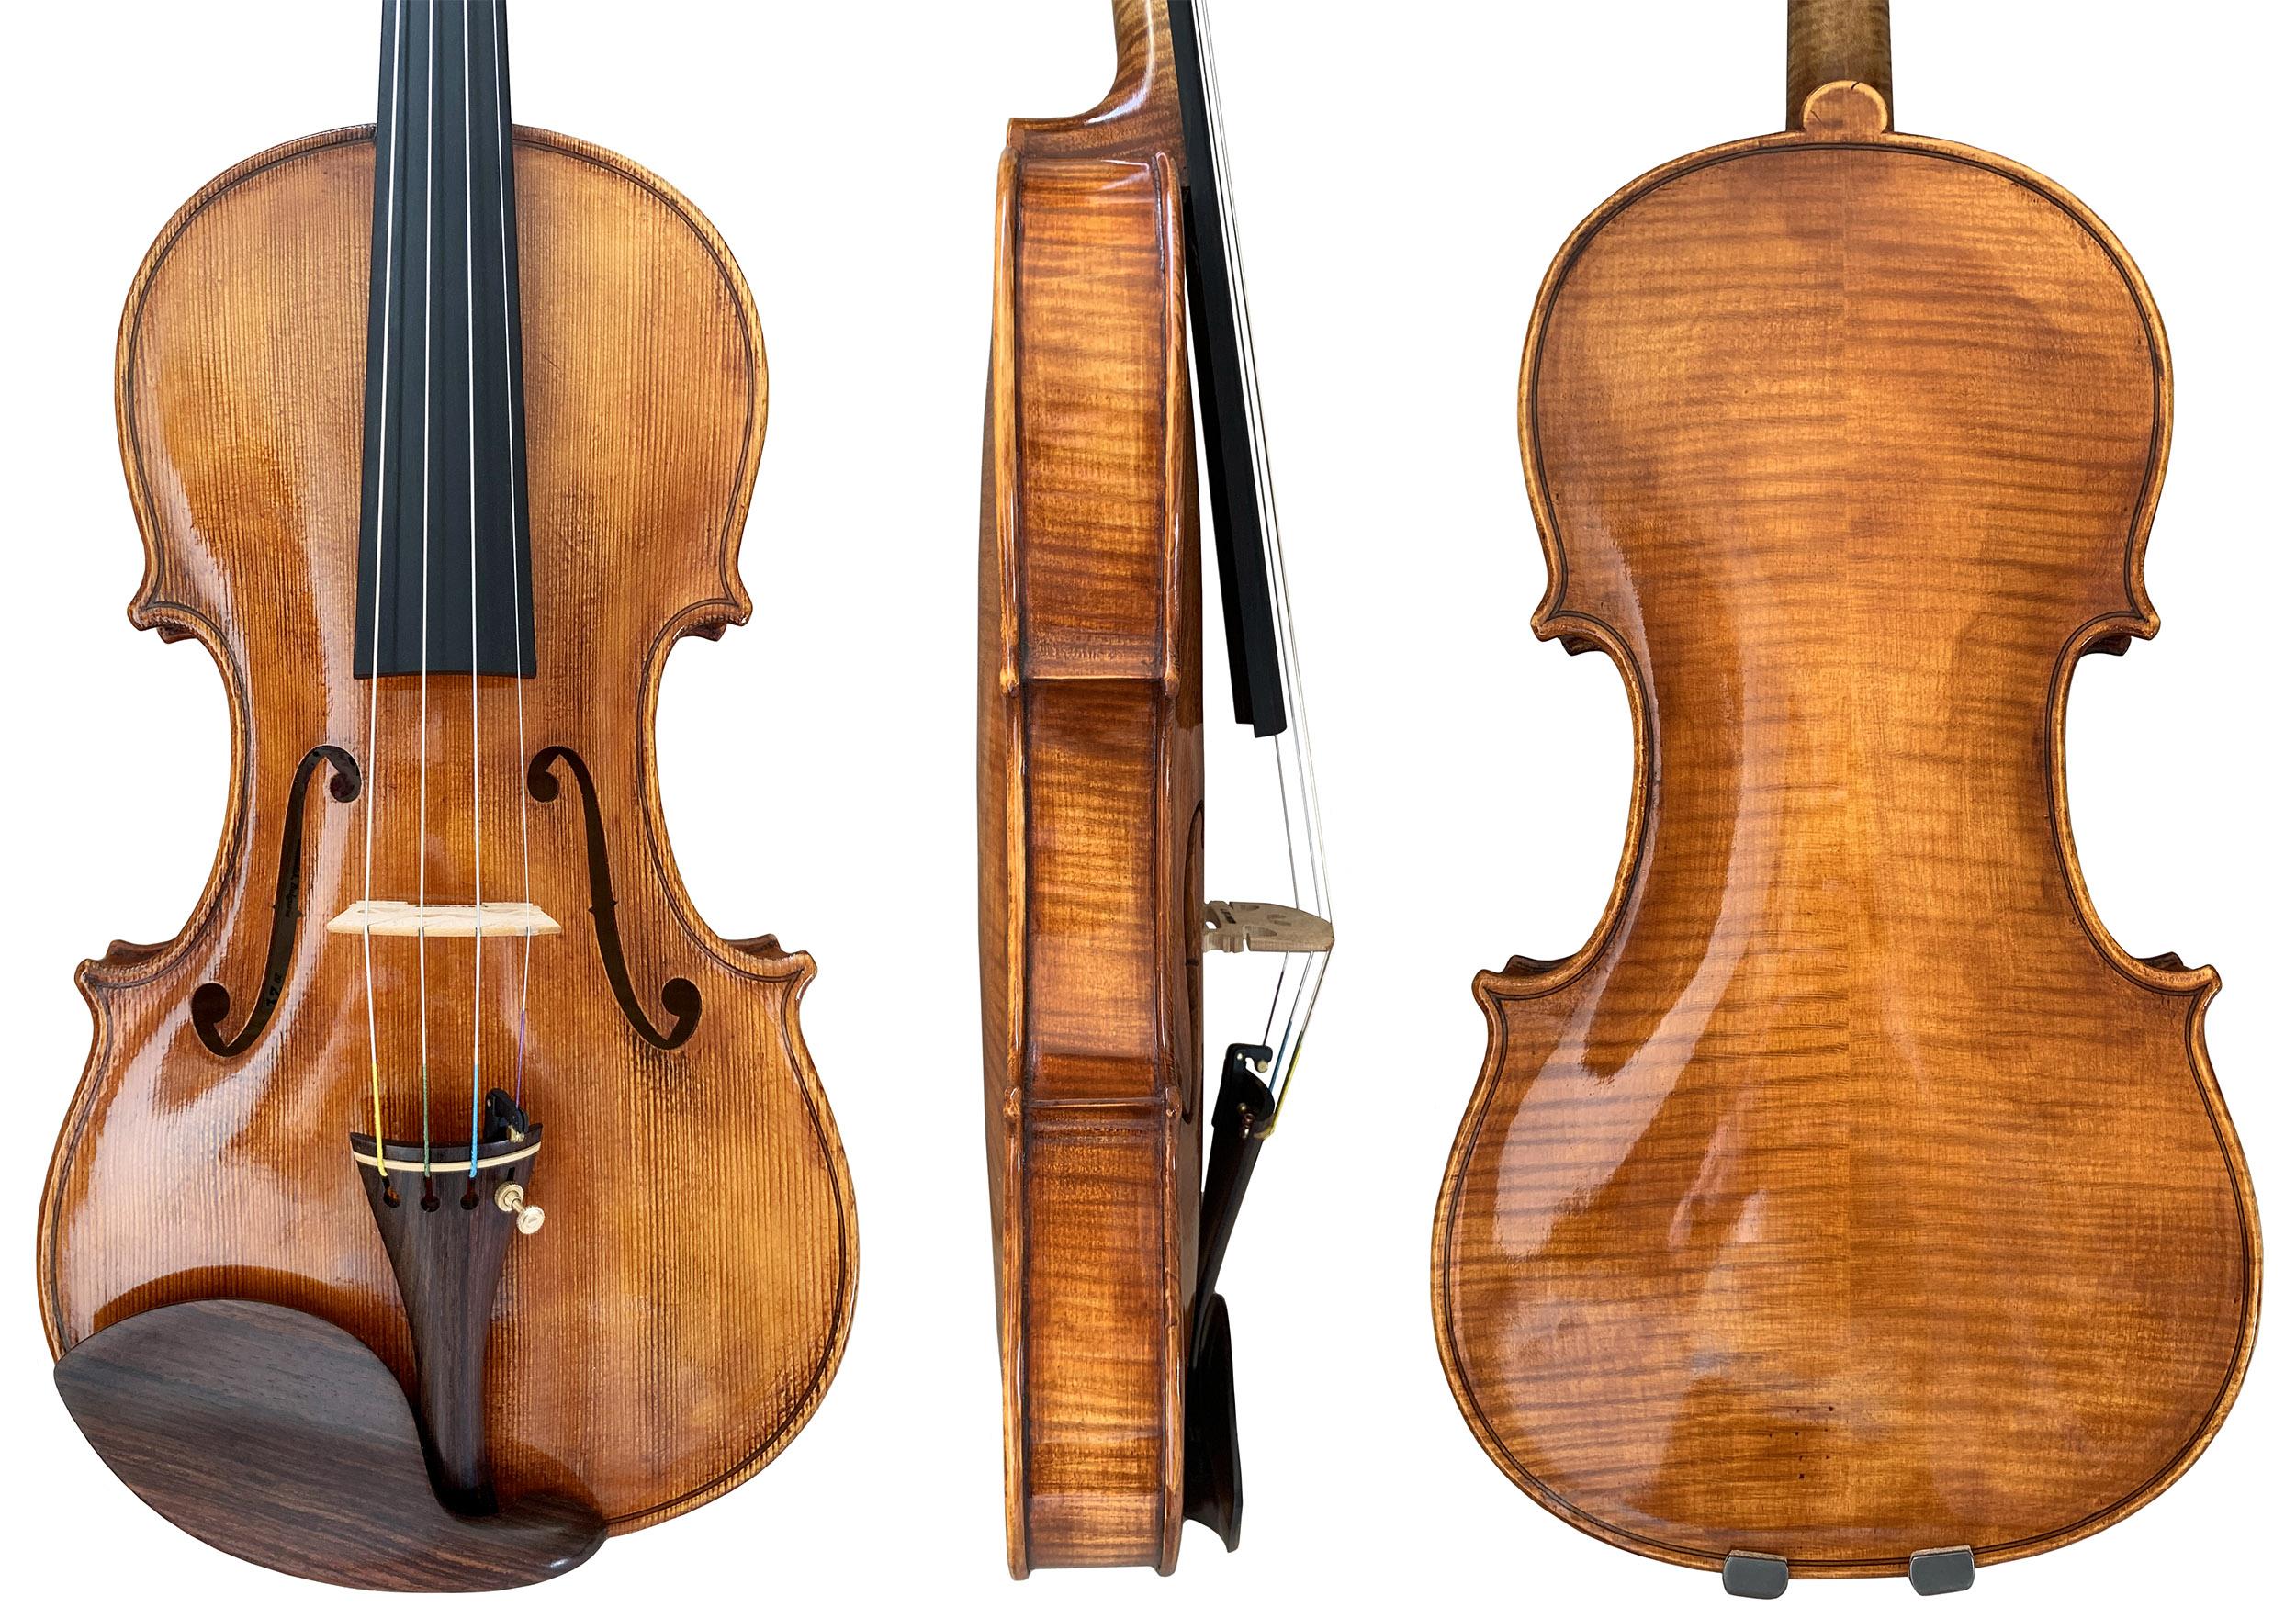 Rose Valley violin front, side and back